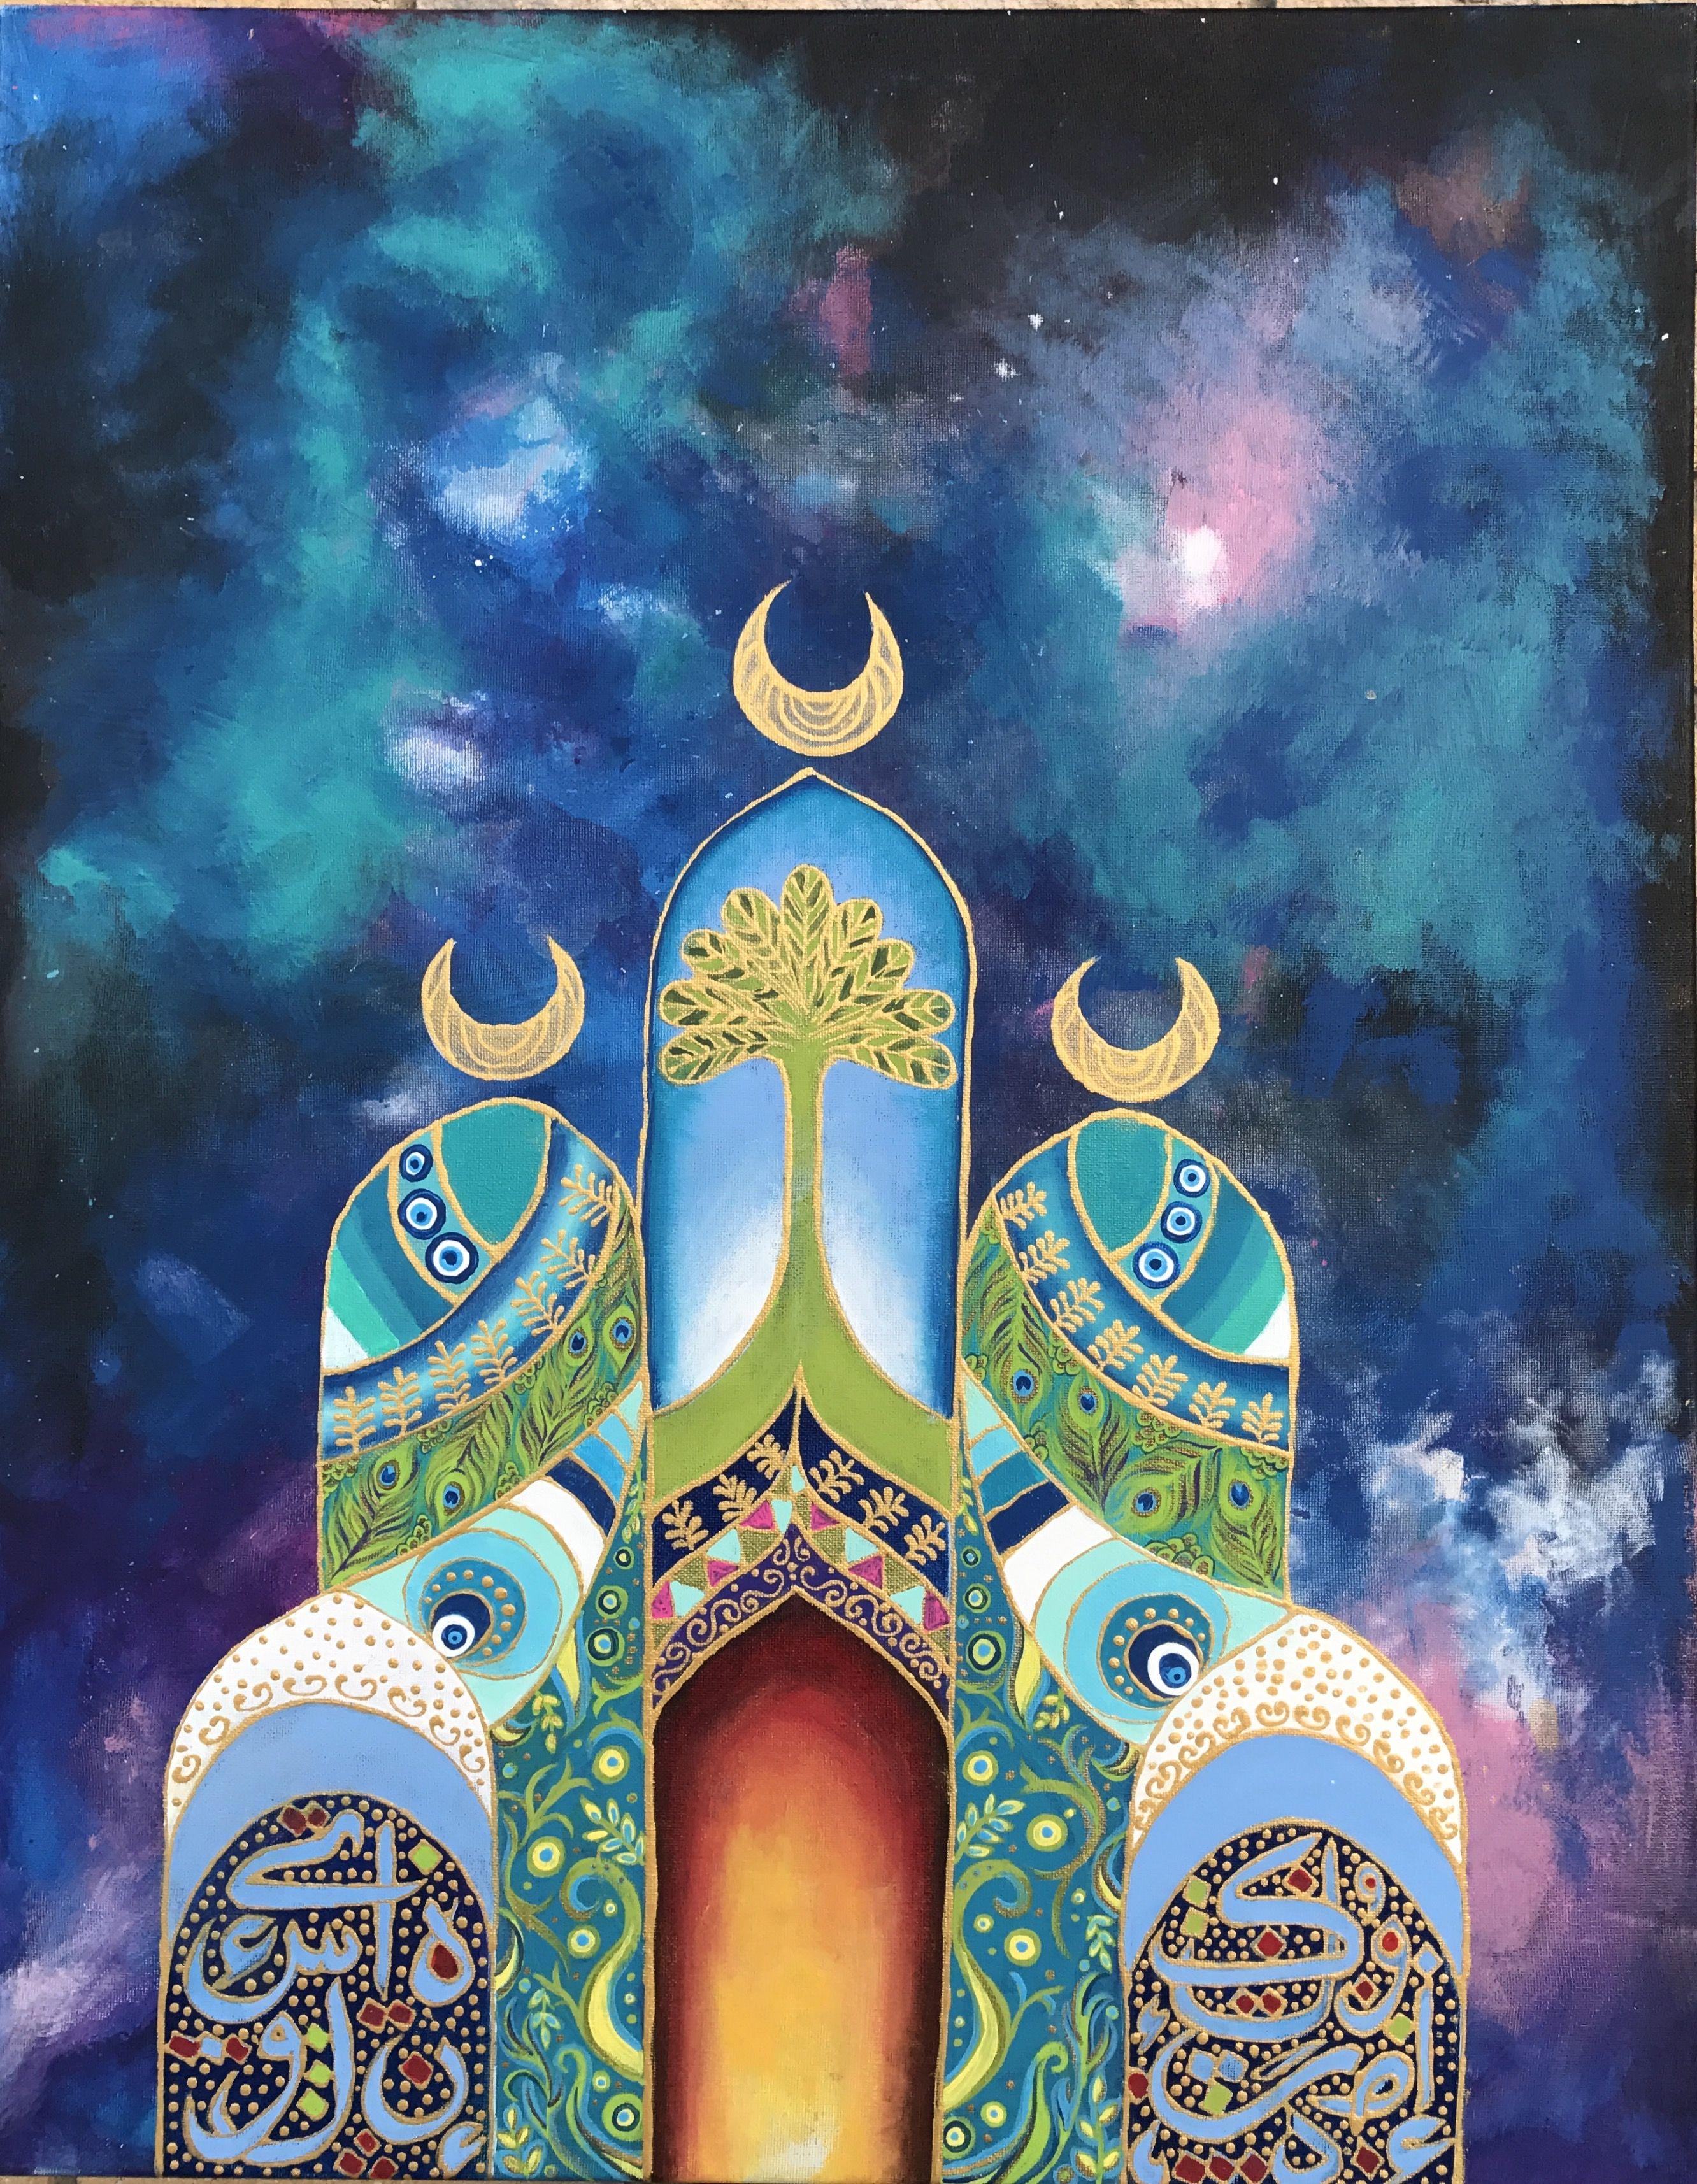 فن تشكيلي عراقي رسومات Islamic Art Calligraphy Cubist Art Mosque Art